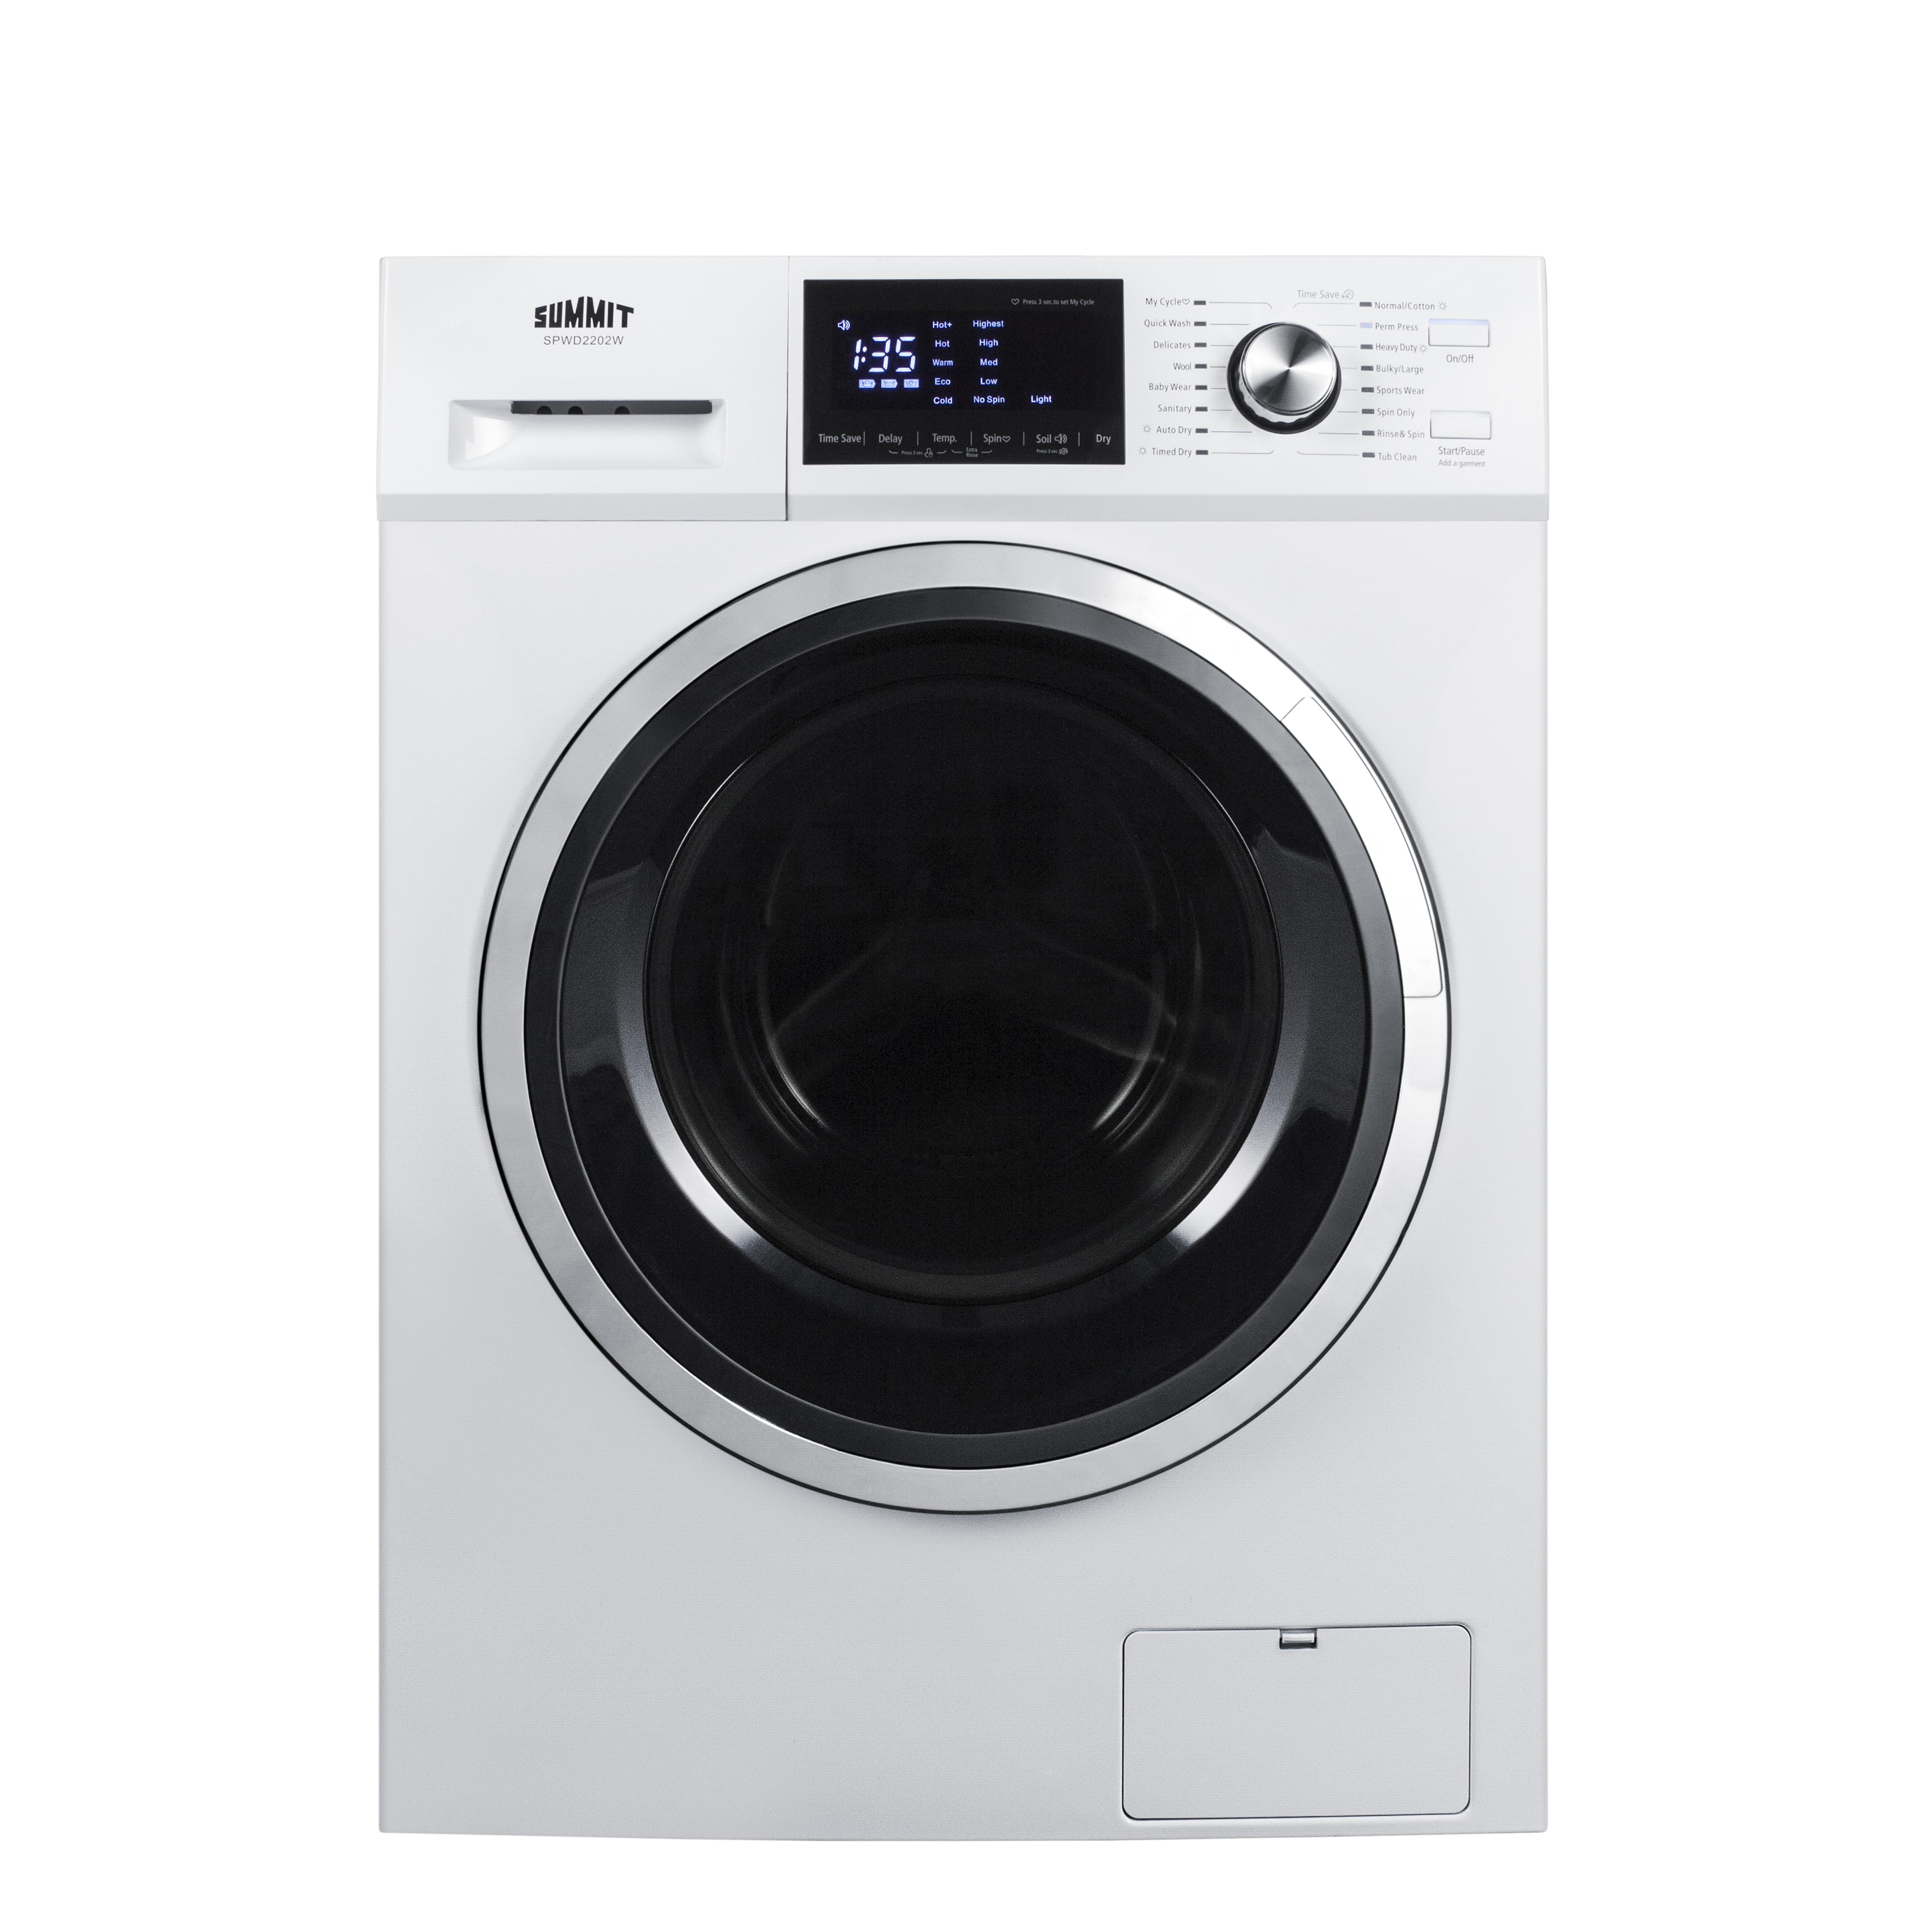 Summit Appliance SPWD2202W laundry washer / dryer combo